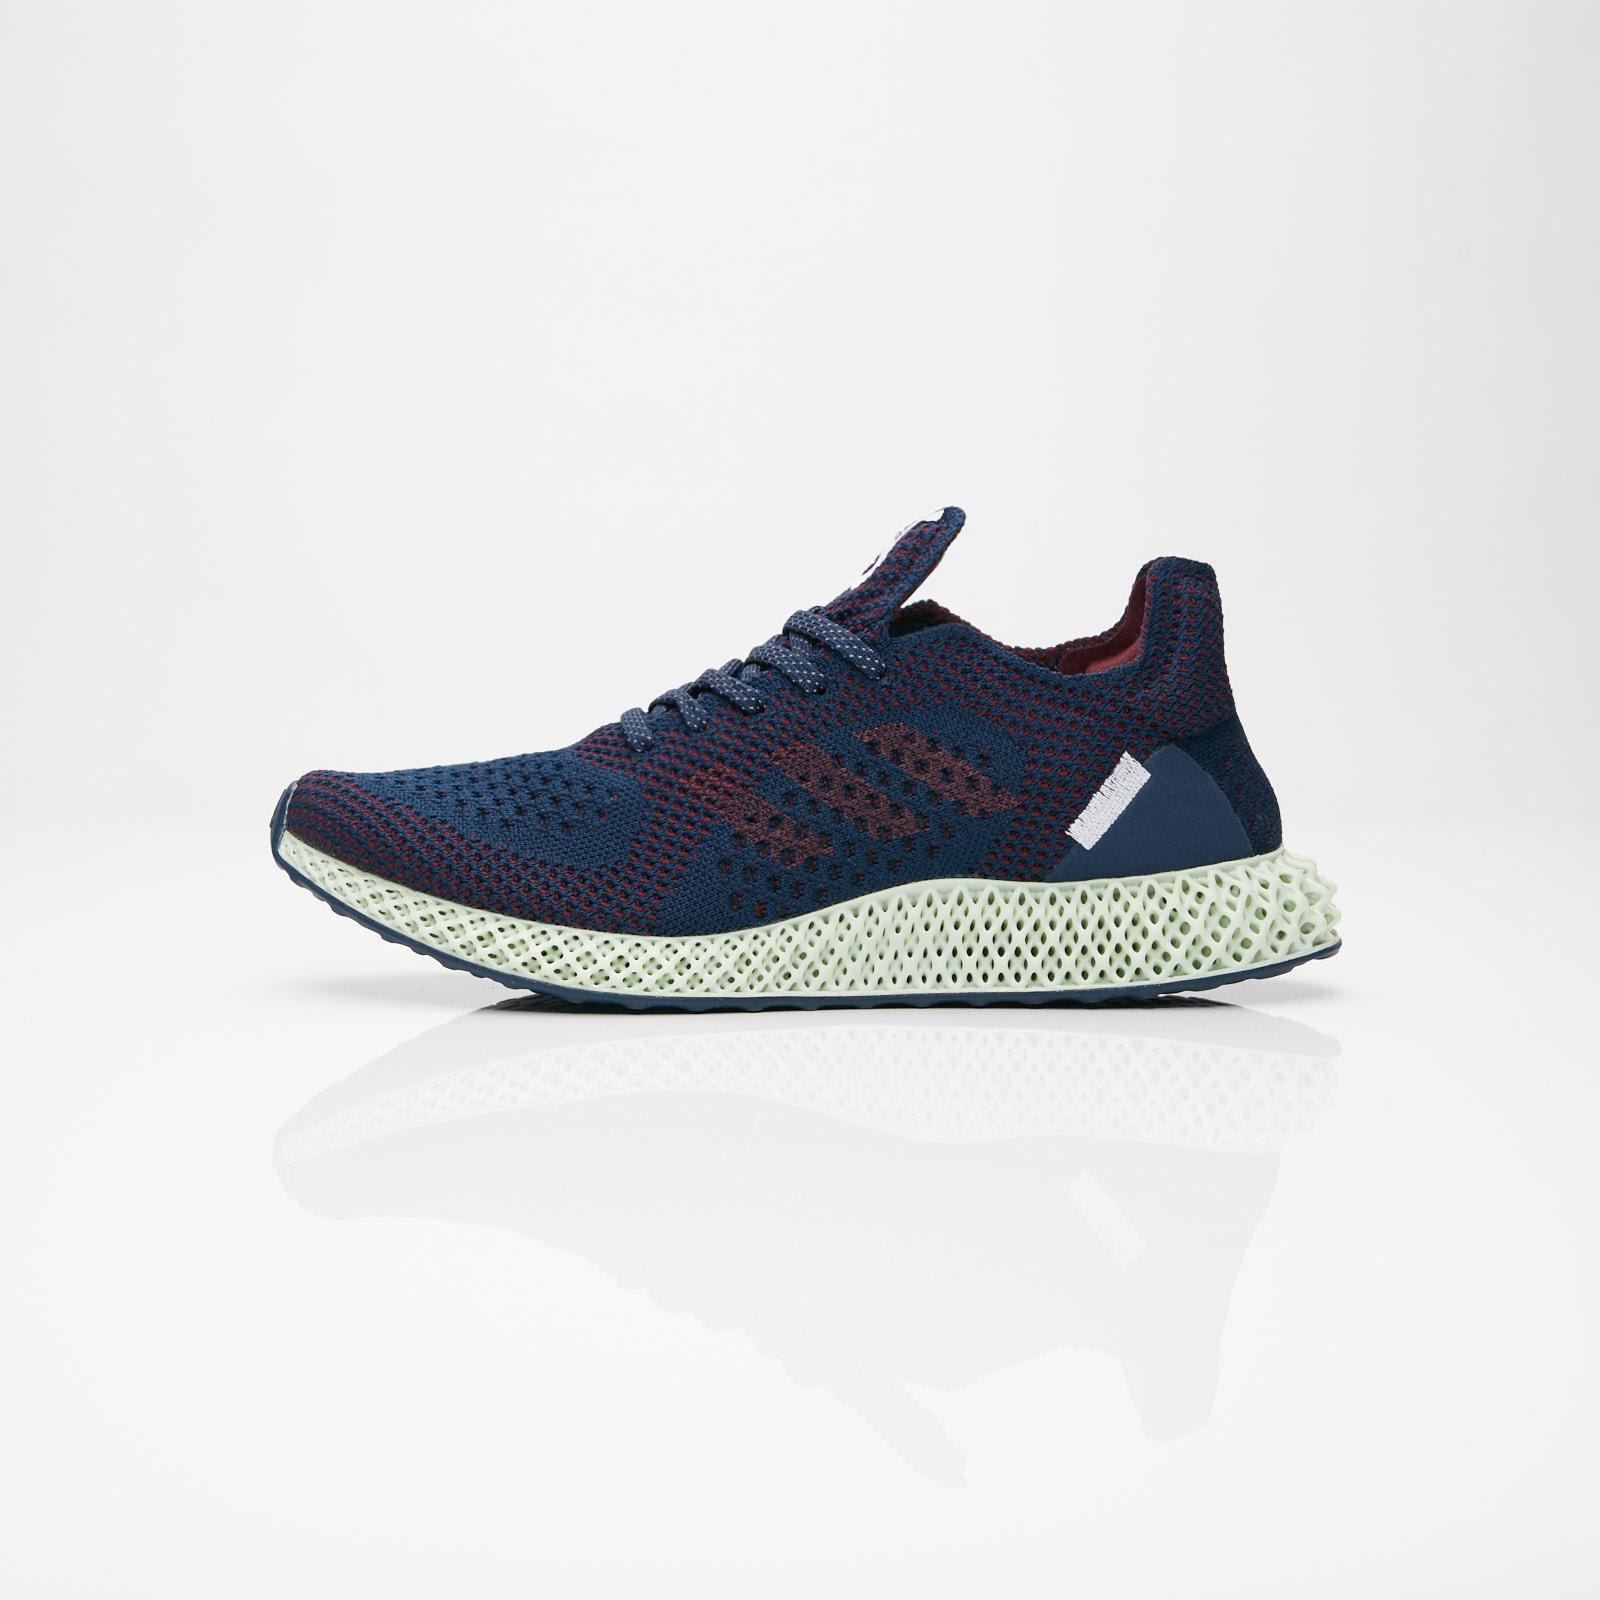 adidas Consortium 4D x Sneakersnstuff adidas Consortium 4D x Sneakersnstuff  ... f333c314f